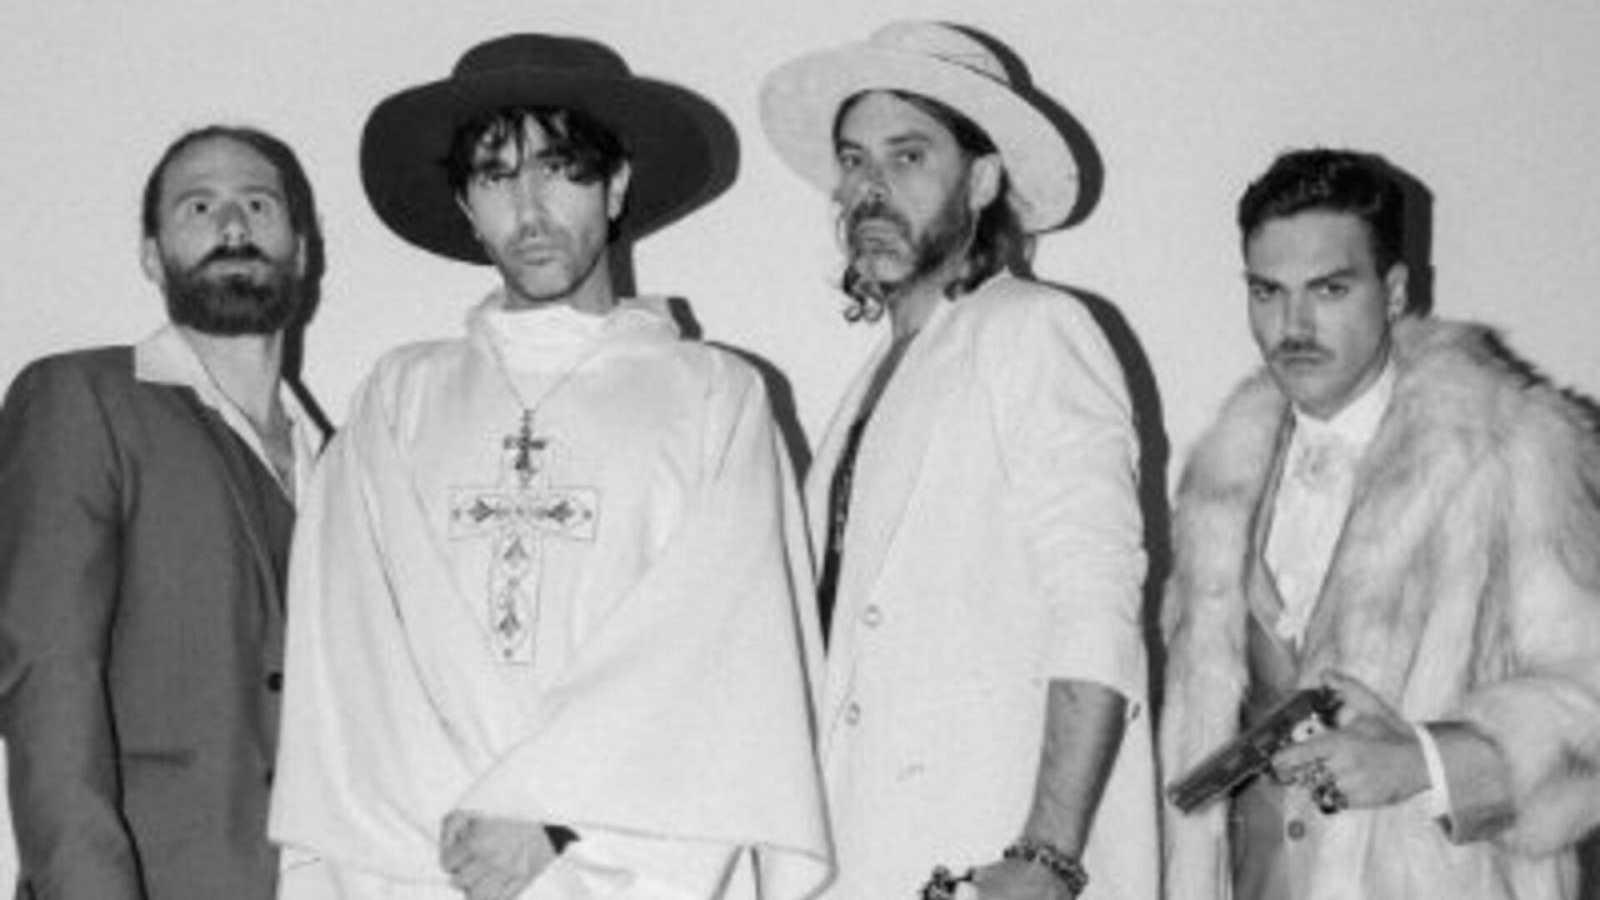 180 grados - Miss Caffeina, Tulsa, Paul Weller y Leon Bridges - 17/05/21 - escuchar ahora